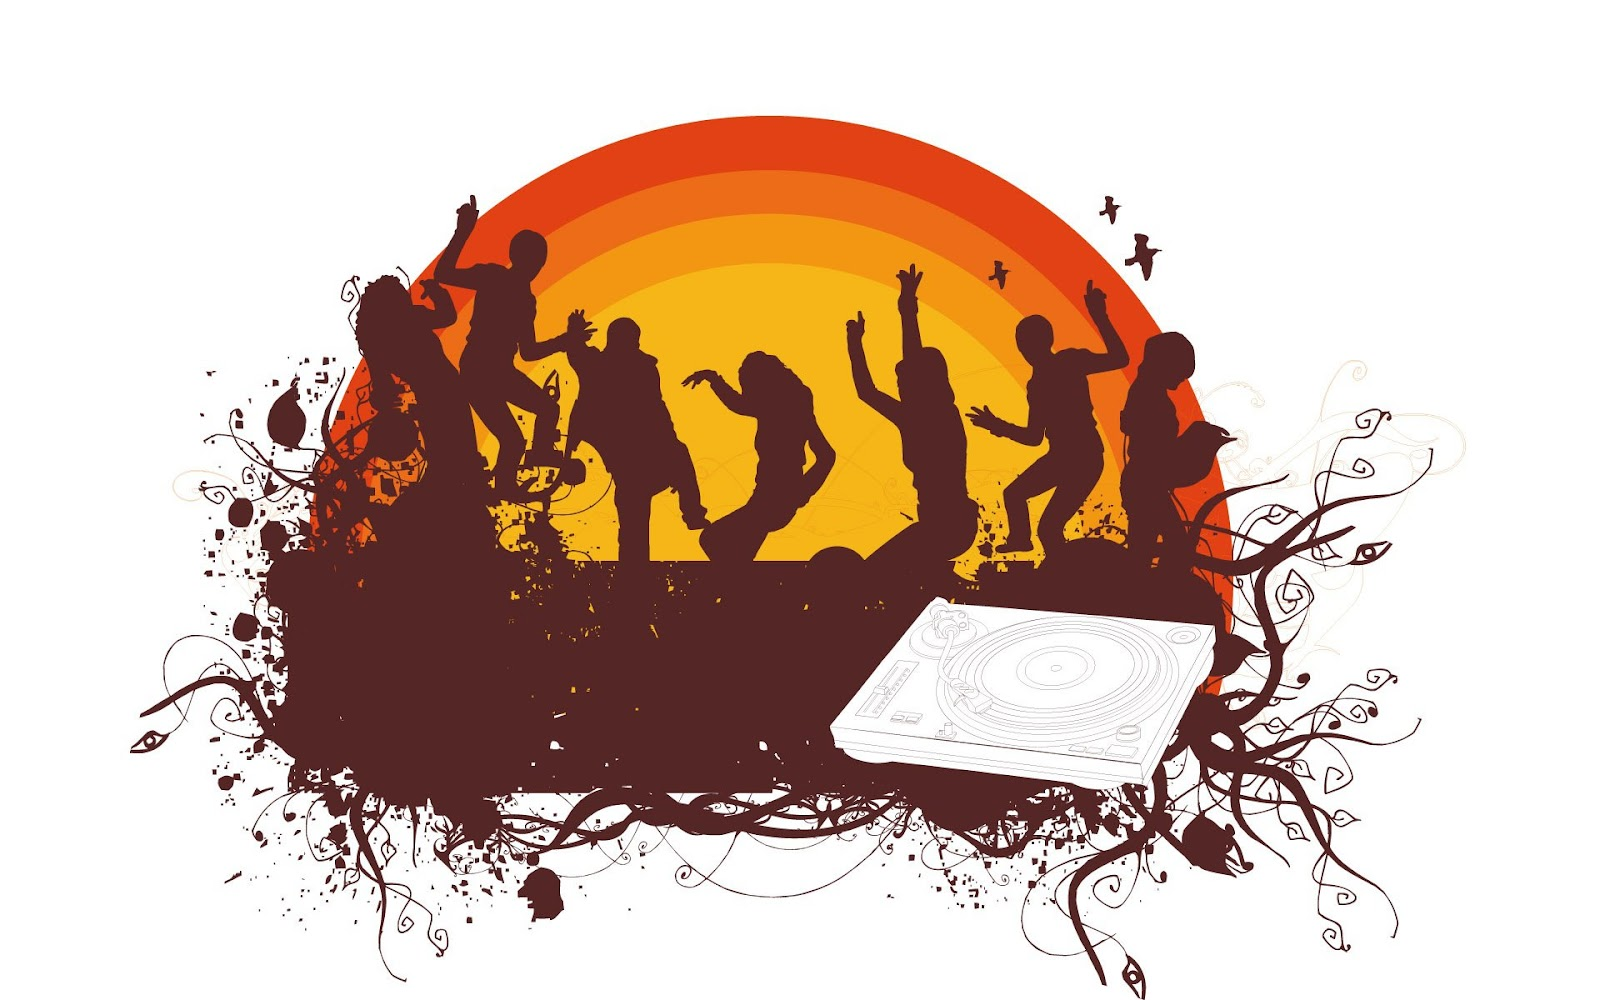 http://3.bp.blogspot.com/-0dMc7XbyHCc/T6Y3l2yW97I/AAAAAAAAB-k/Db0pZH09Fu0/s1600/dance-2-1920x1200.jpg